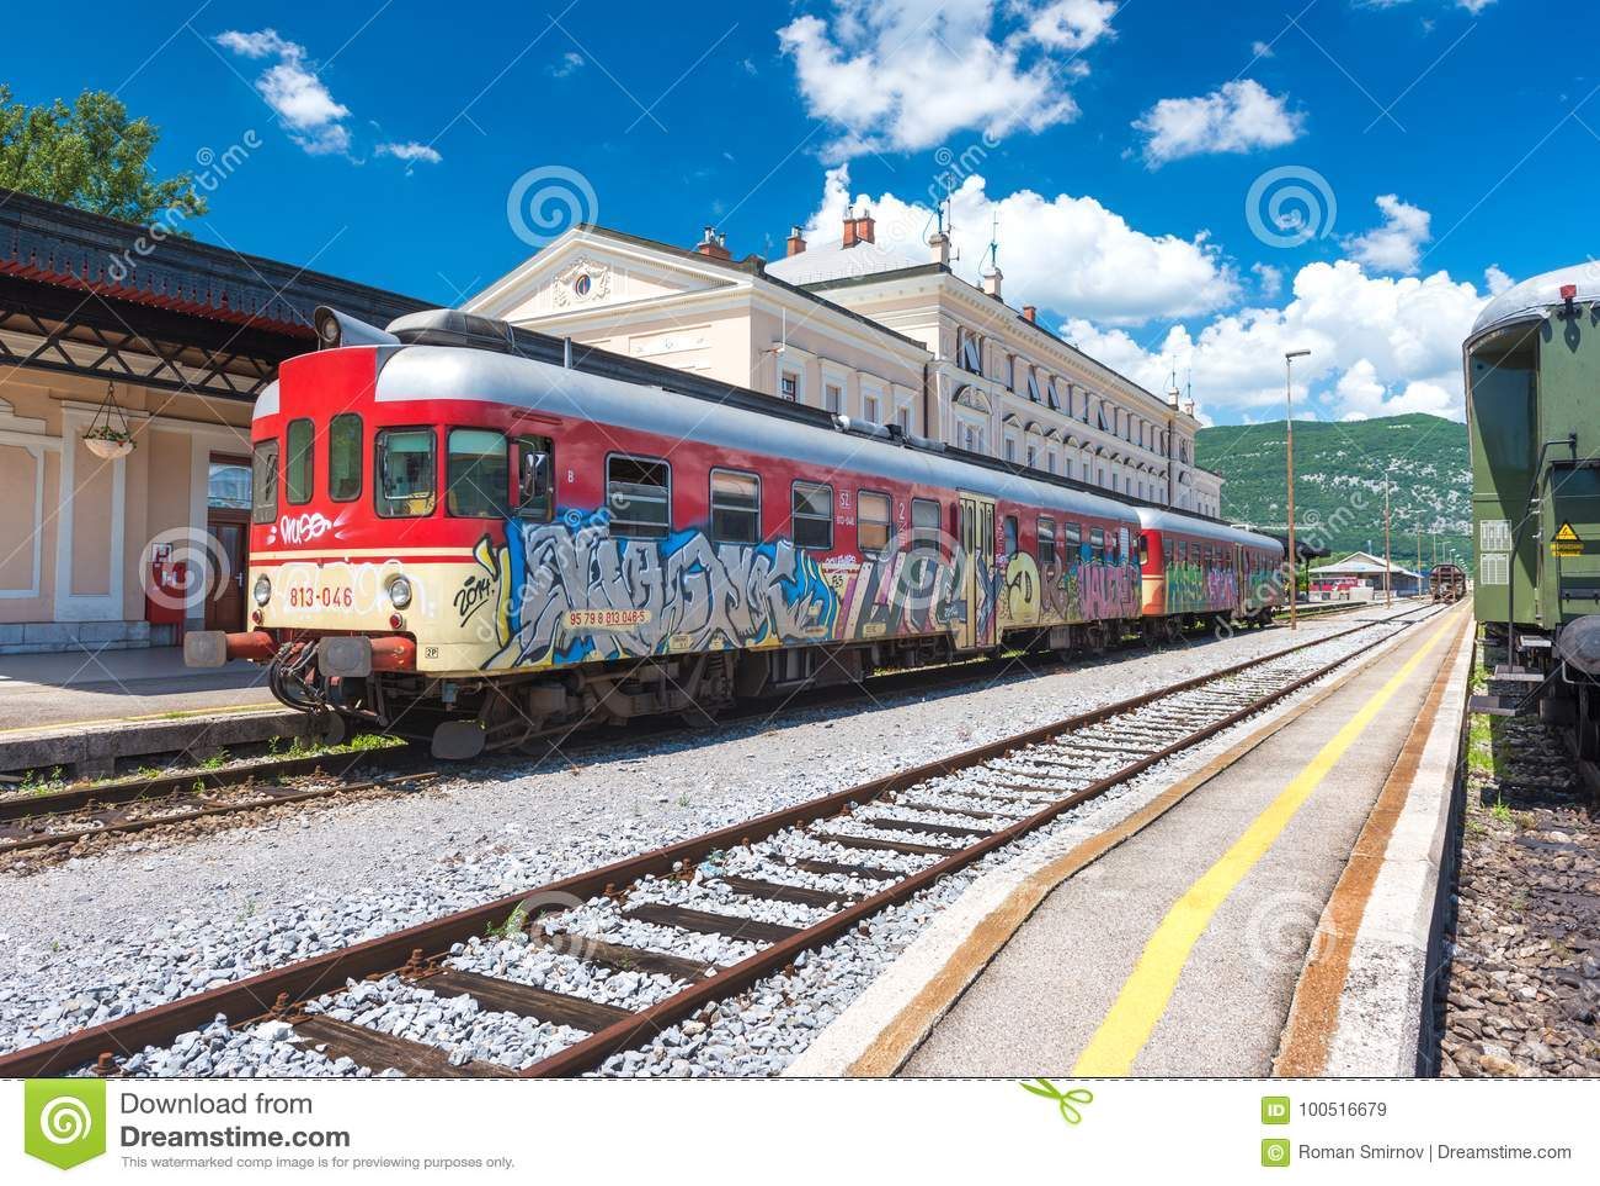 Nova Gorica Slovenien: Det röda drevet med grafitti står på spår på drevstationen